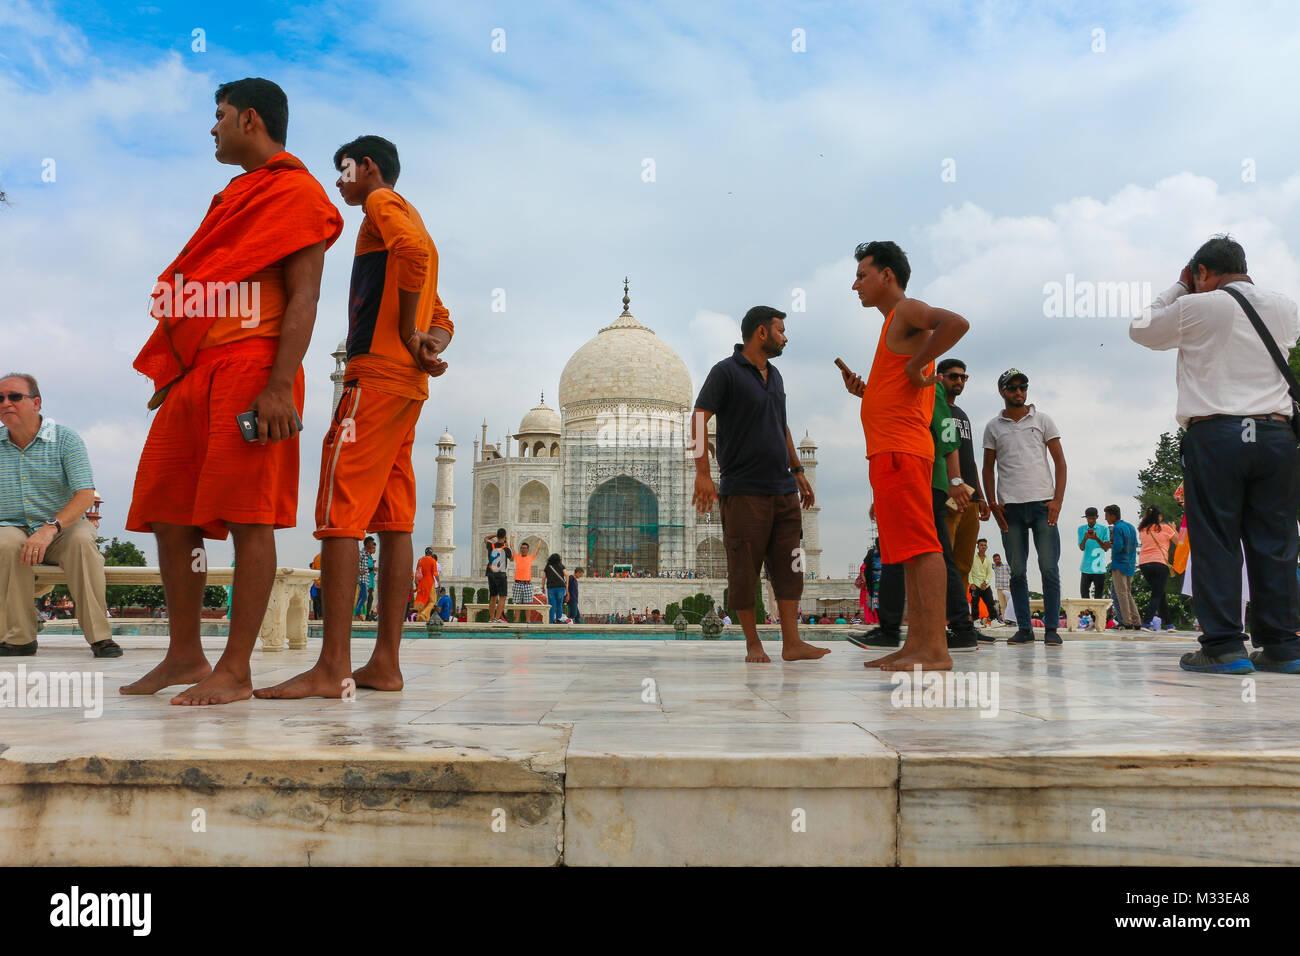 Taj Mahal Palace, Agra, Uttar Pradesh, India Immagini Stock